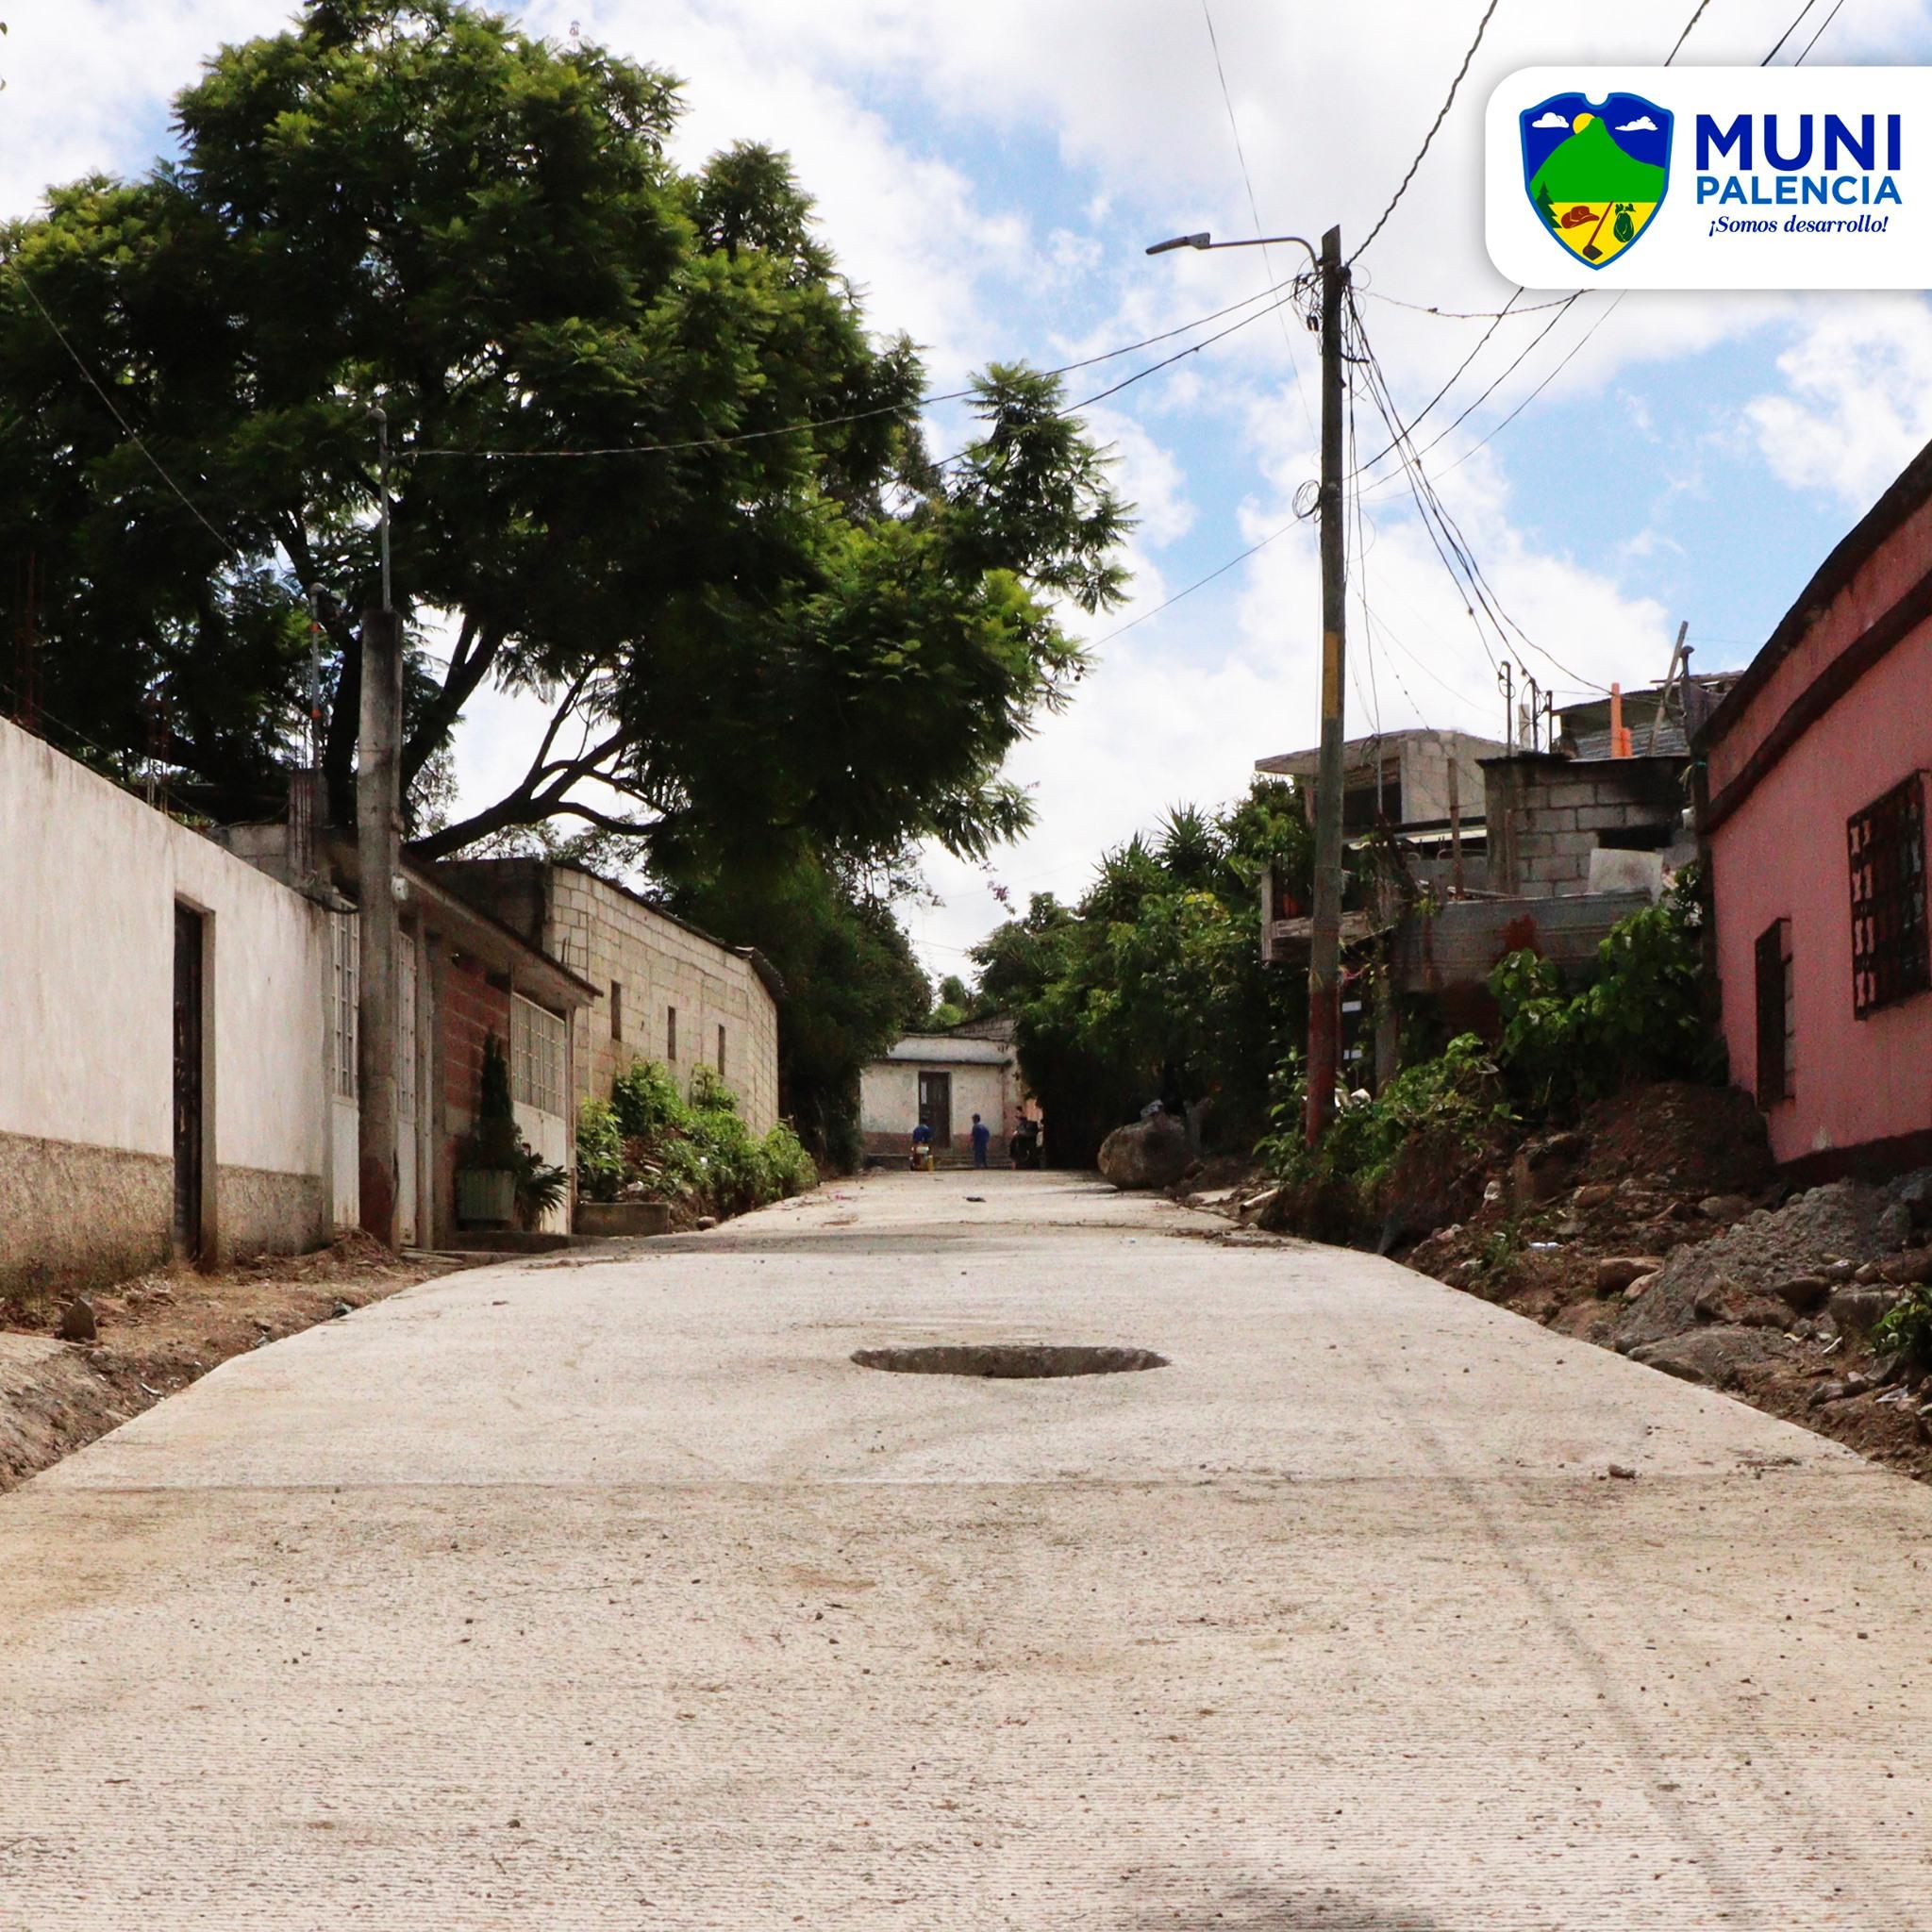 municipalidad de palencia, palencia, administracion municipal, municipalidad, beto reyes, alberto reyes, alcalde